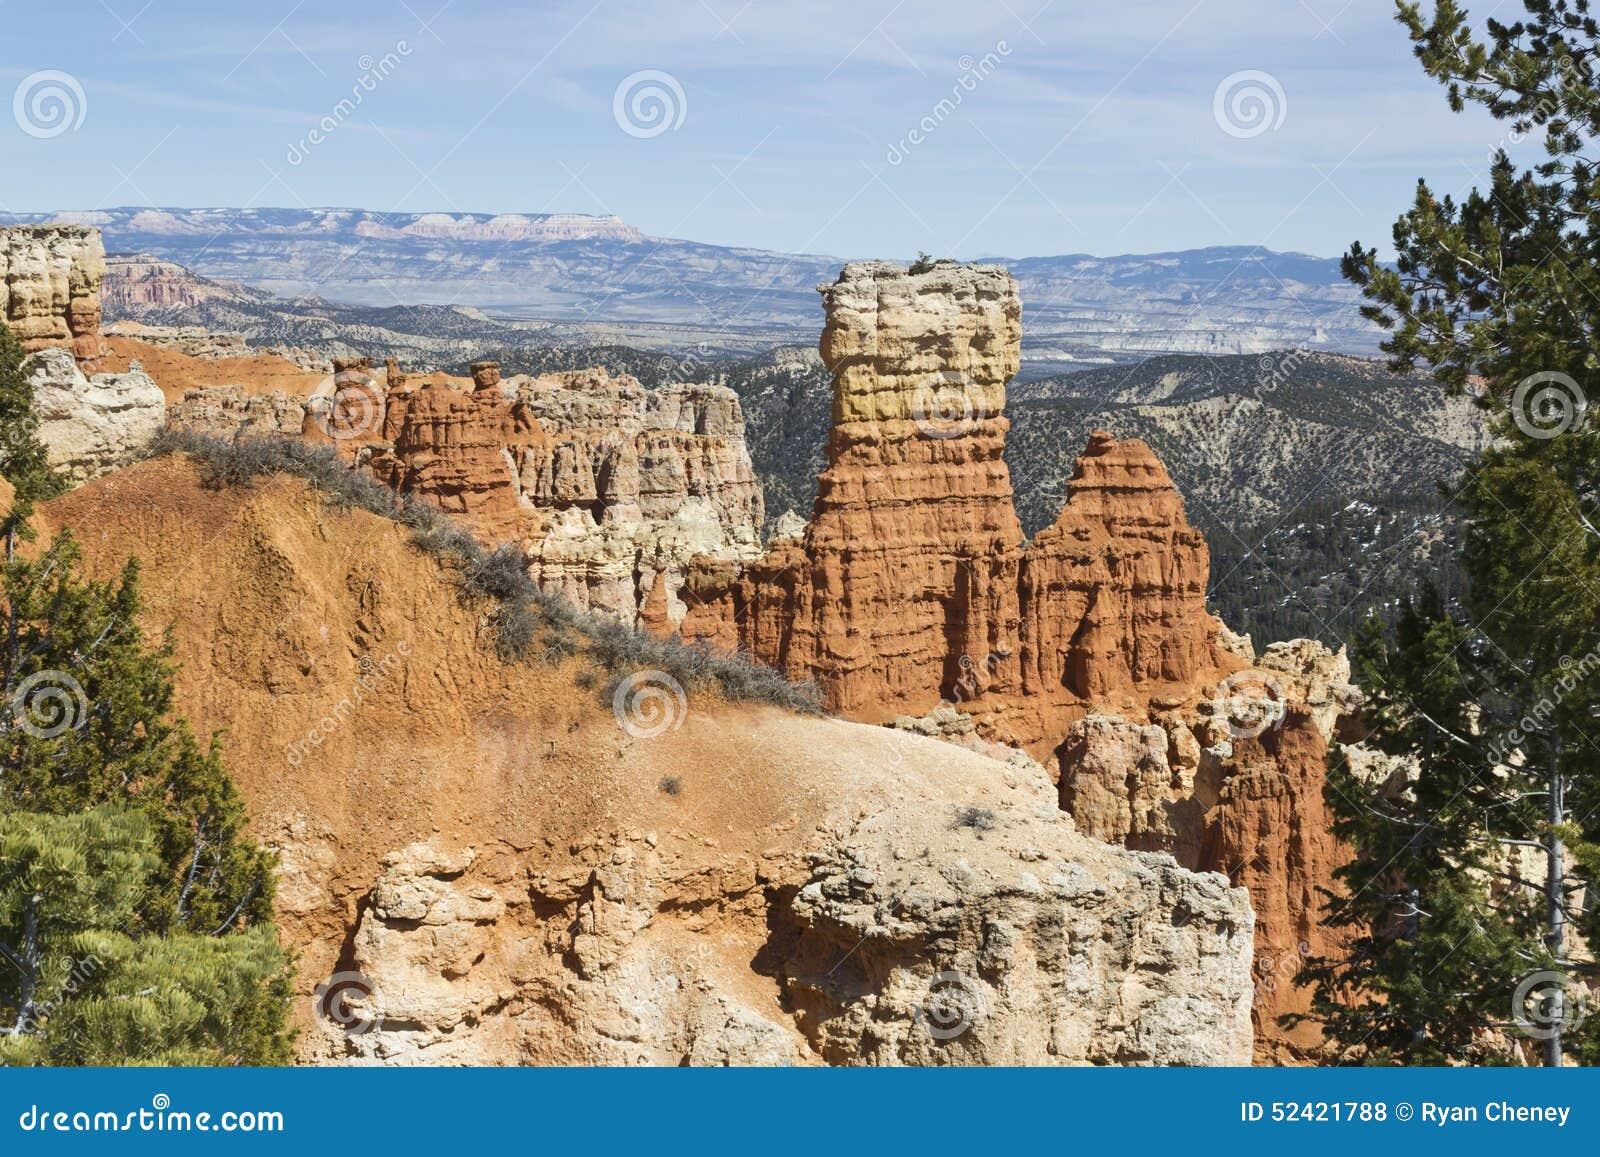 Bryce Canyon Hoodoo Formations